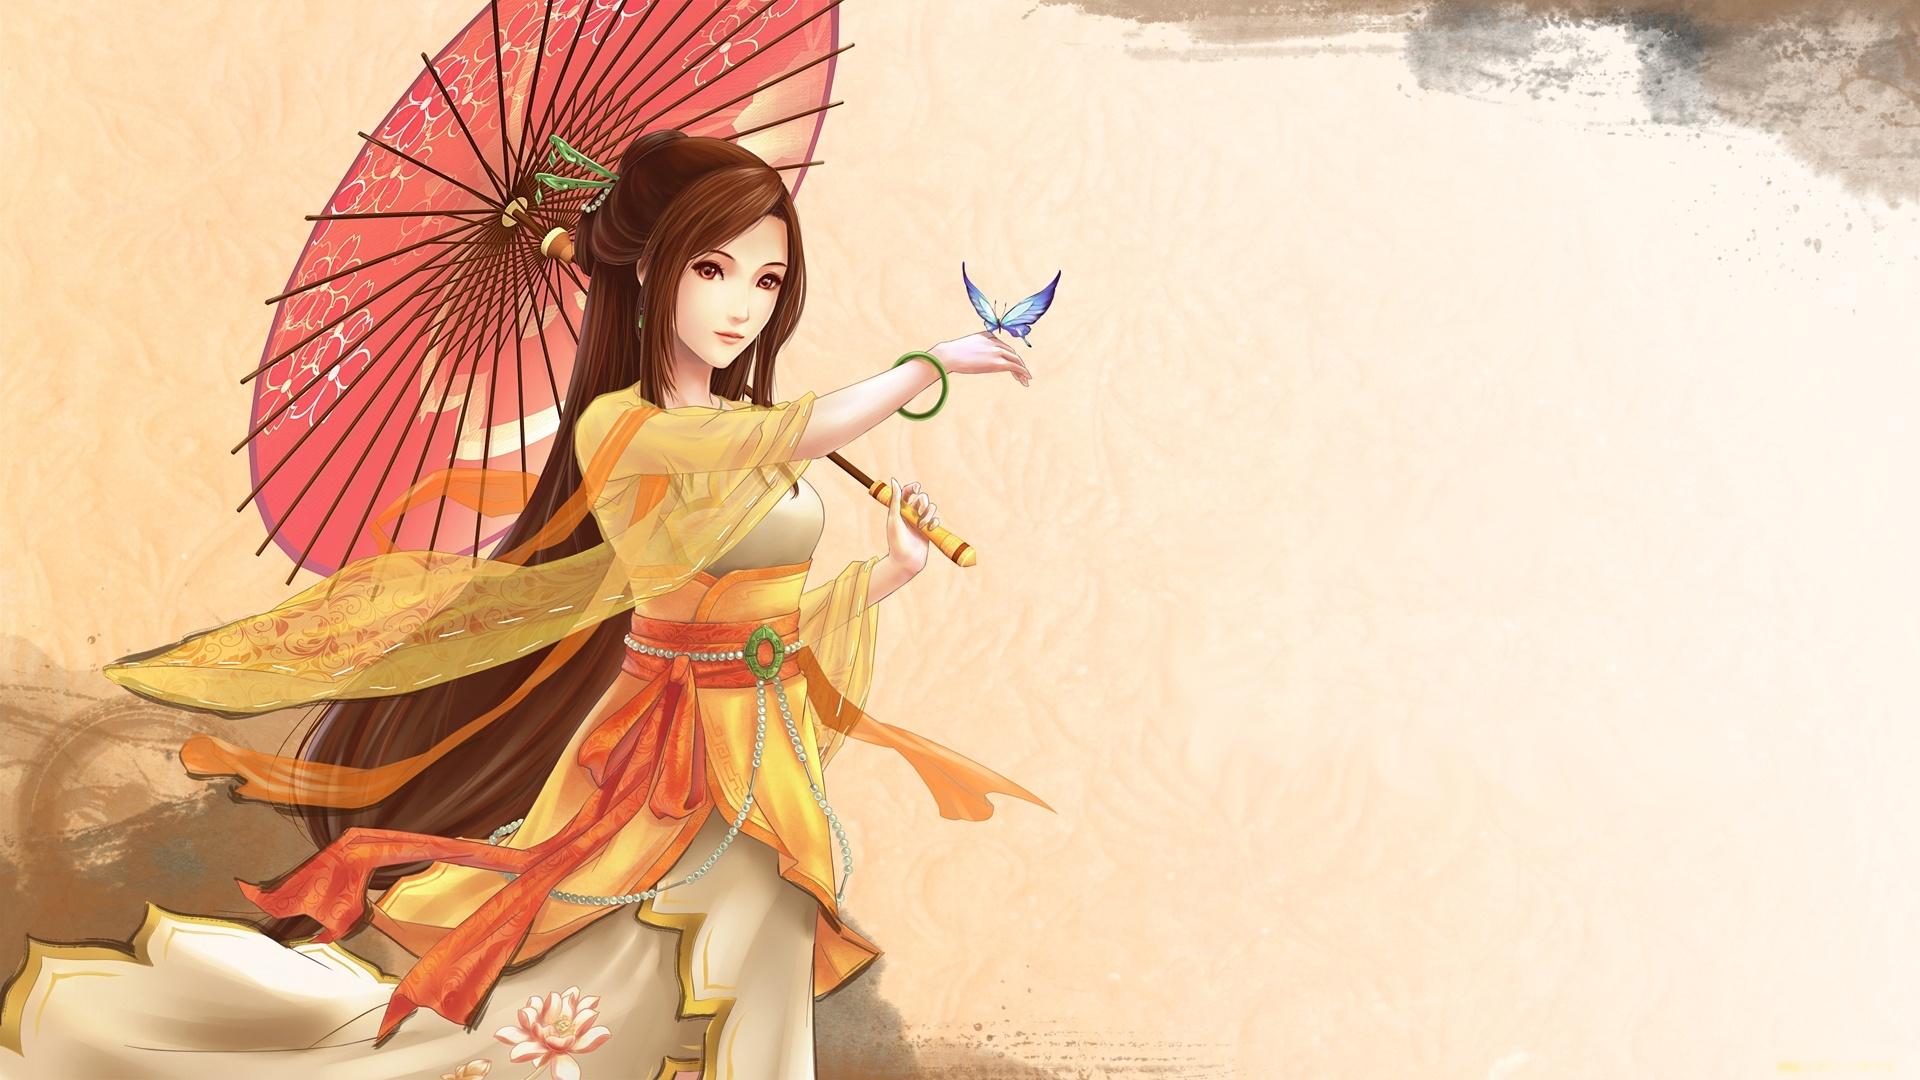 Japanese girls anime, mature ladies and video